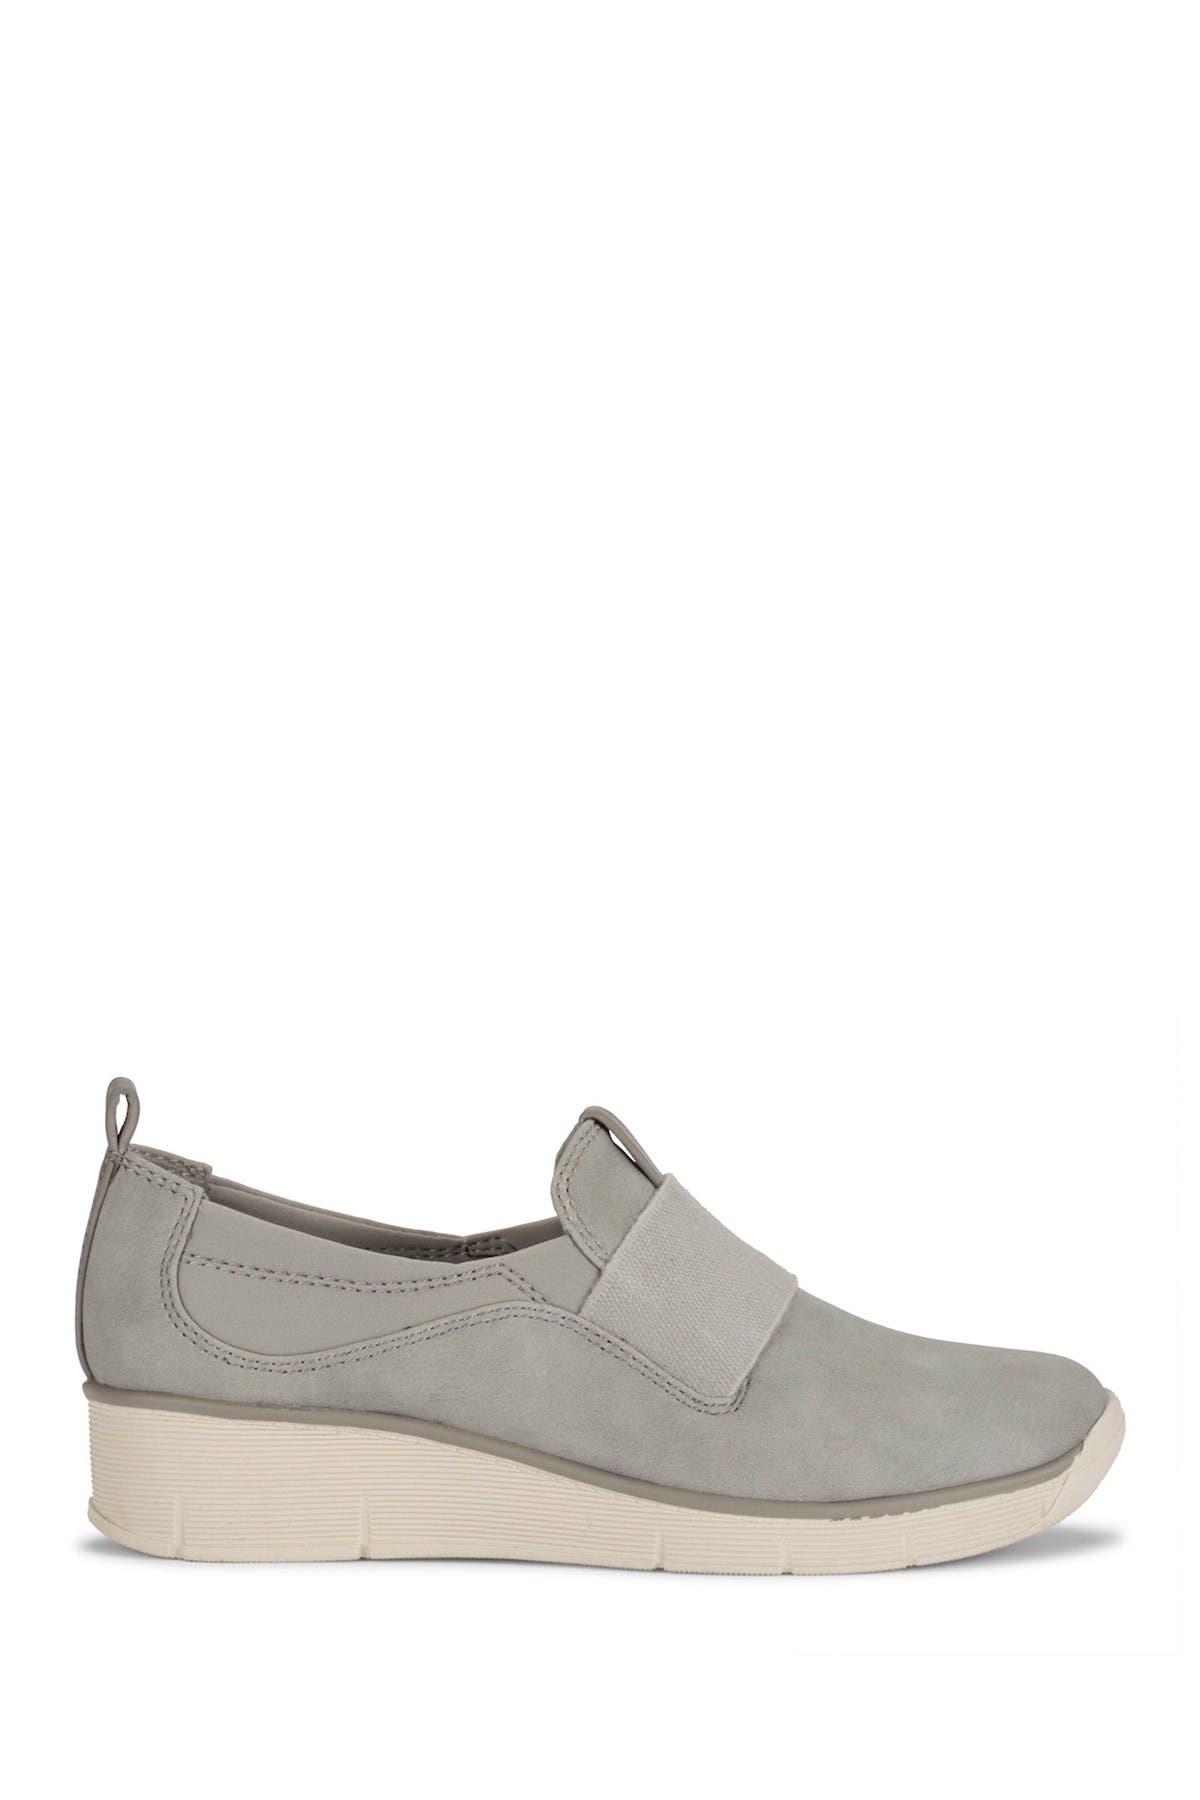 Baretraps Sneakers GARNER CASUAL SLIP-ON SNEAKER